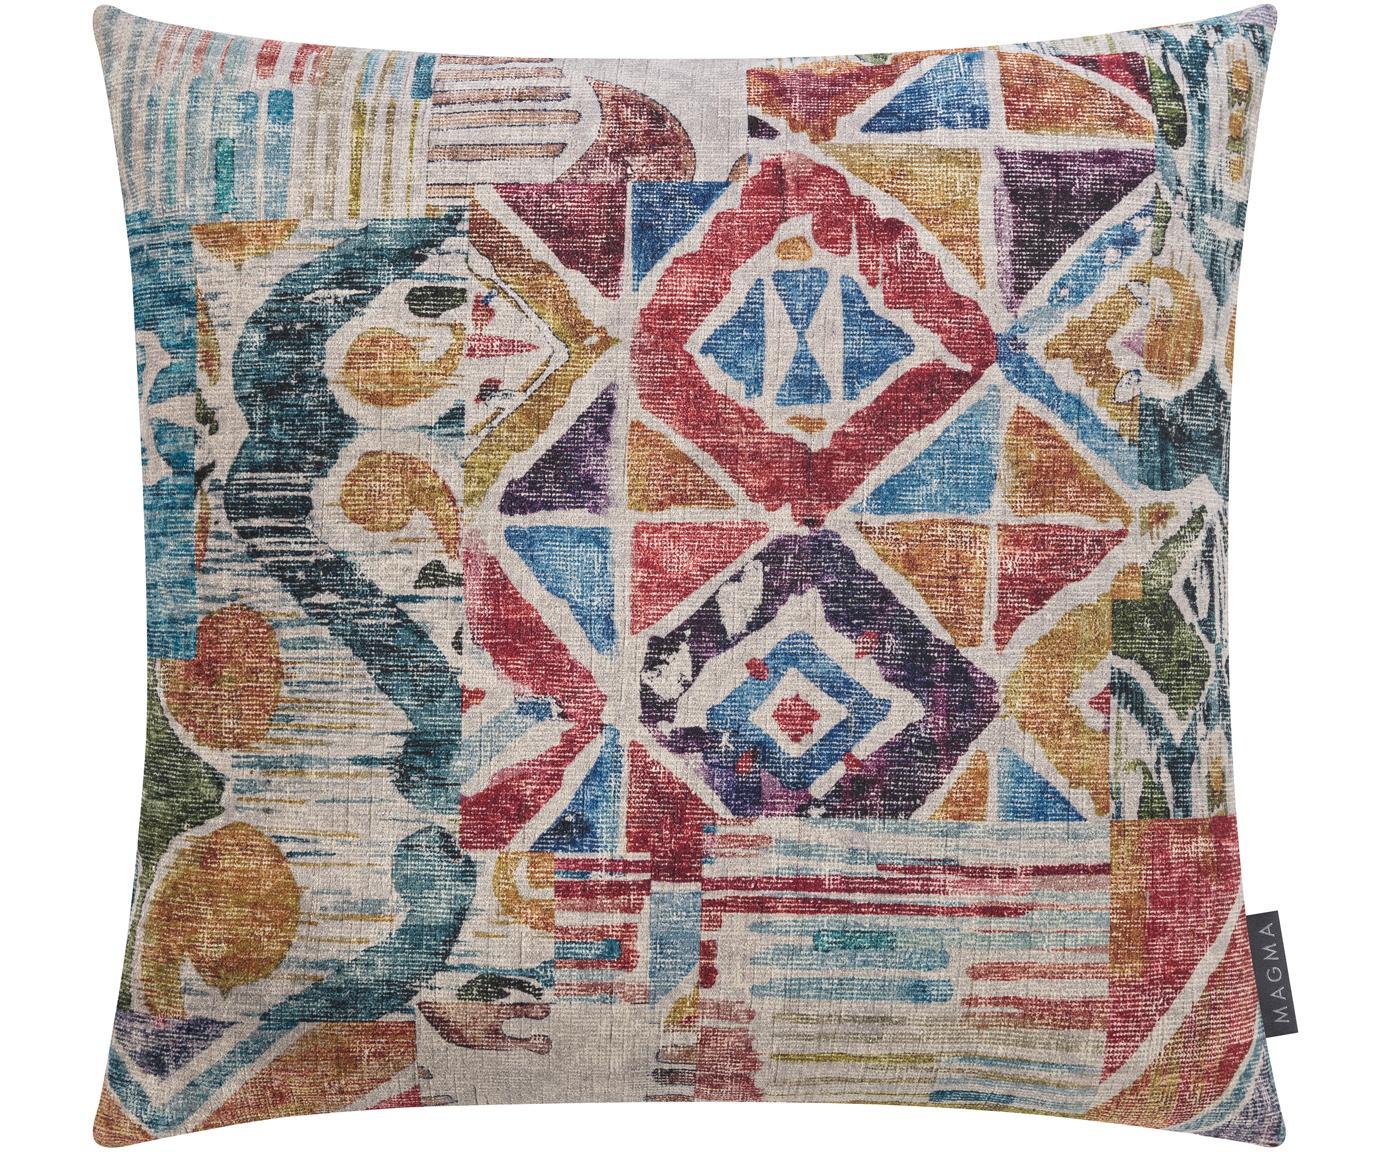 Samt-Kissenhülle Cosima mit buntem Ethno-Muster, 100% Polyestersamt, Weinrot, Mehrfarbig, 50 x 50 cm